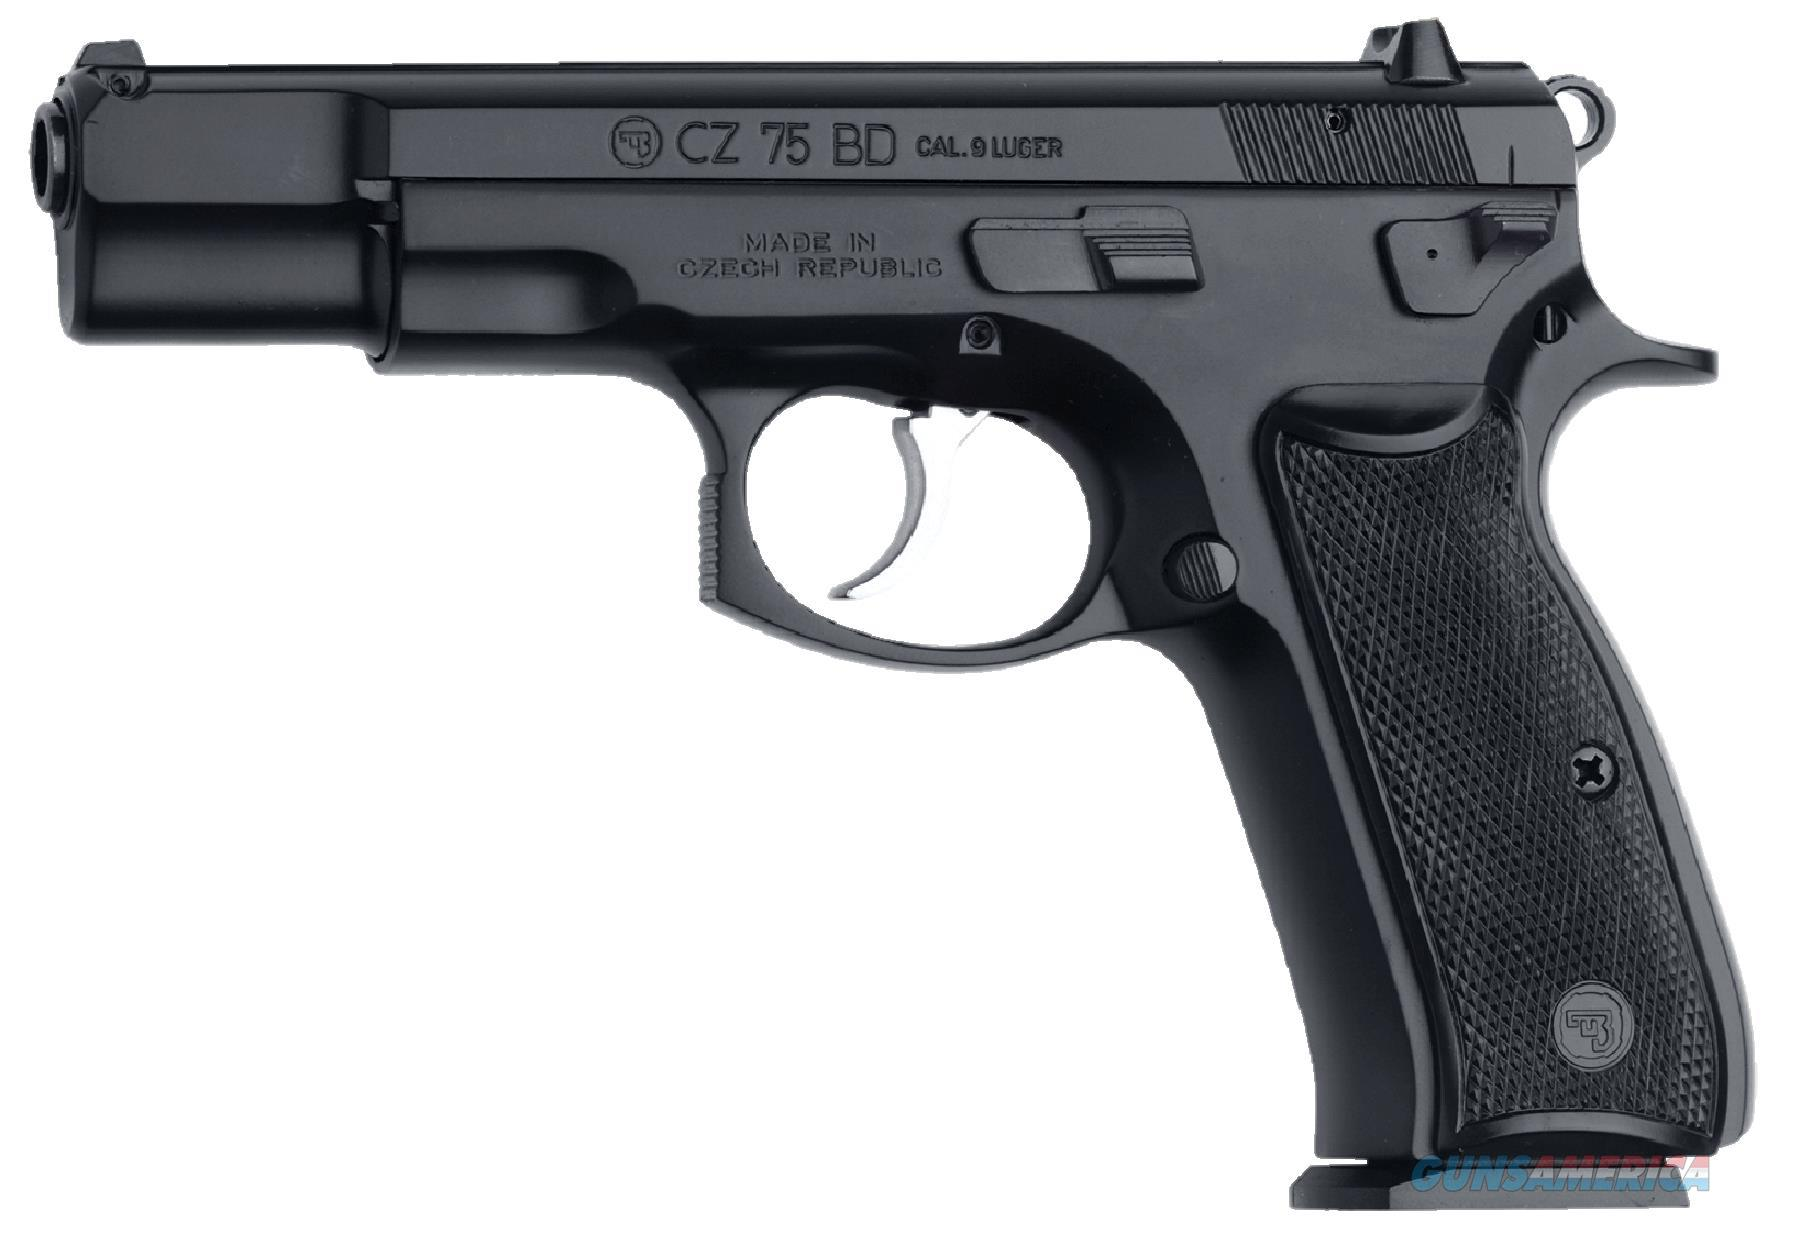 Cz Usa 75 Bd 9Mm Blk 10Rd Ca Compliant 01130  Guns > Pistols > C Misc Pistols